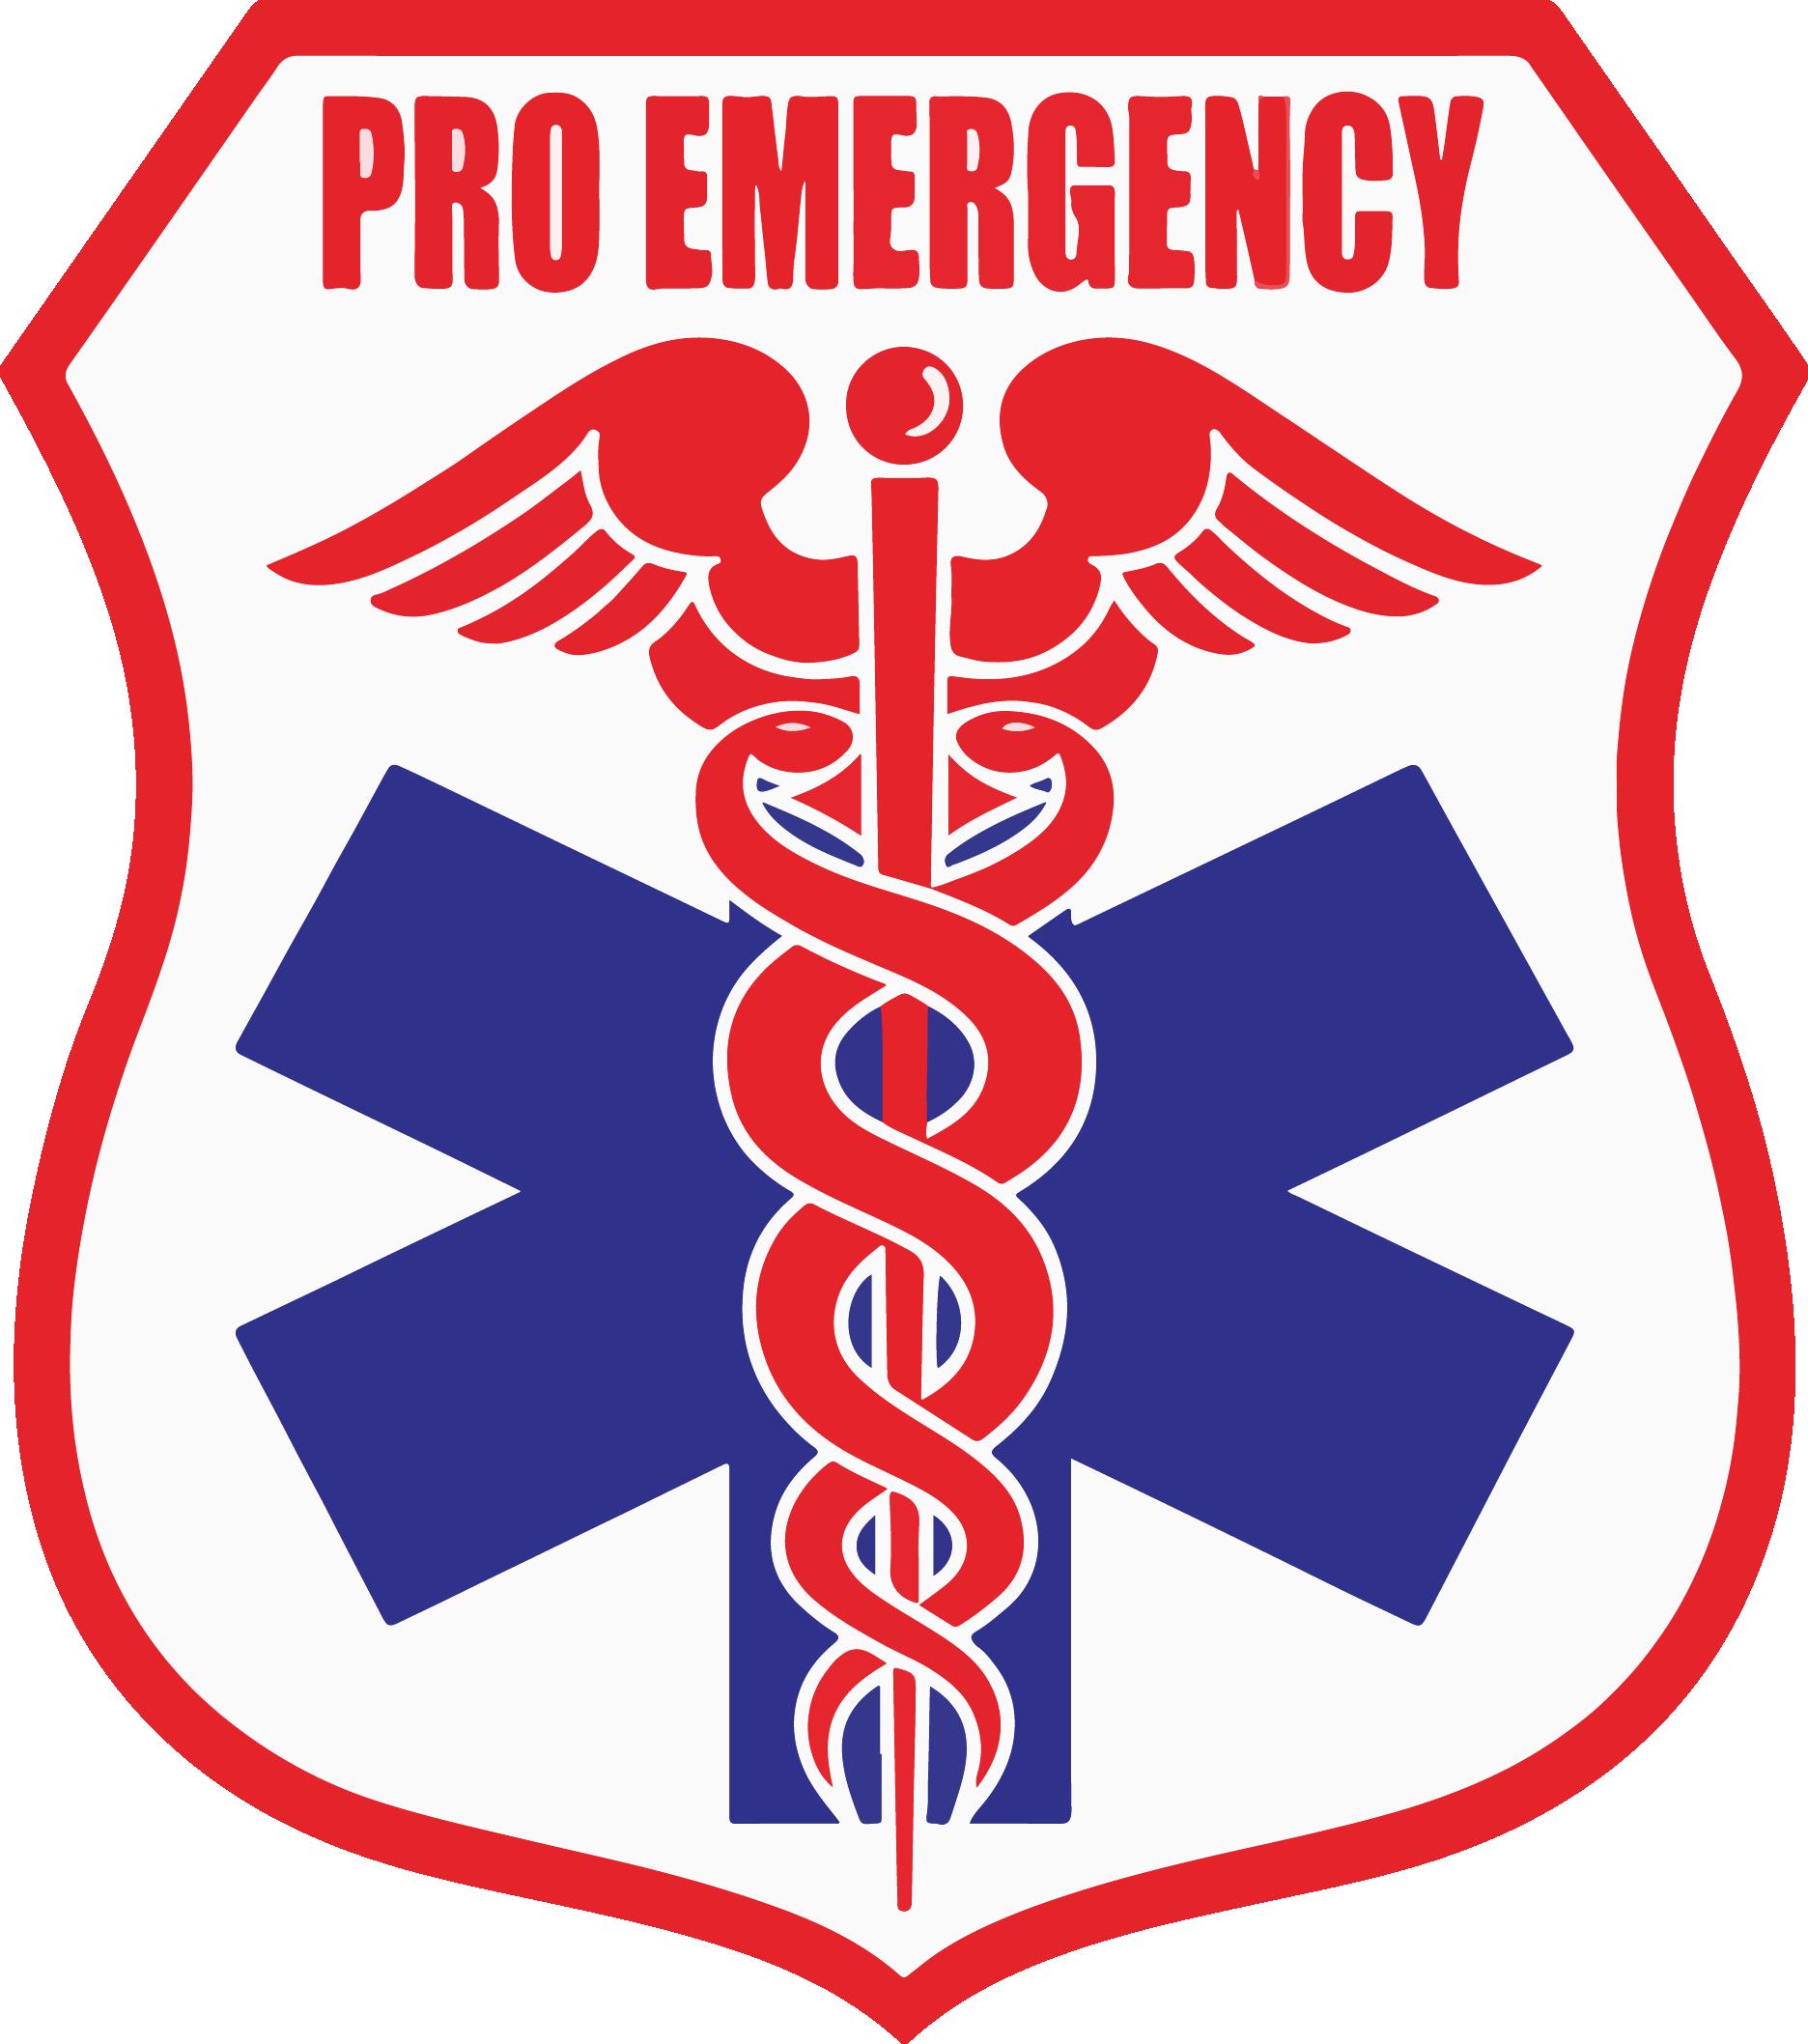 Pro Emergency